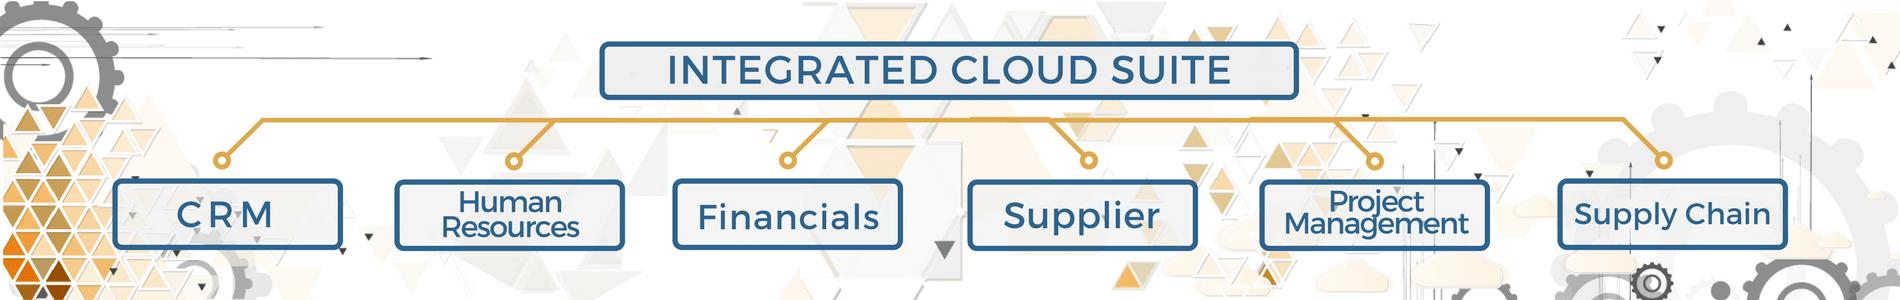 Integrated Cloud Suite